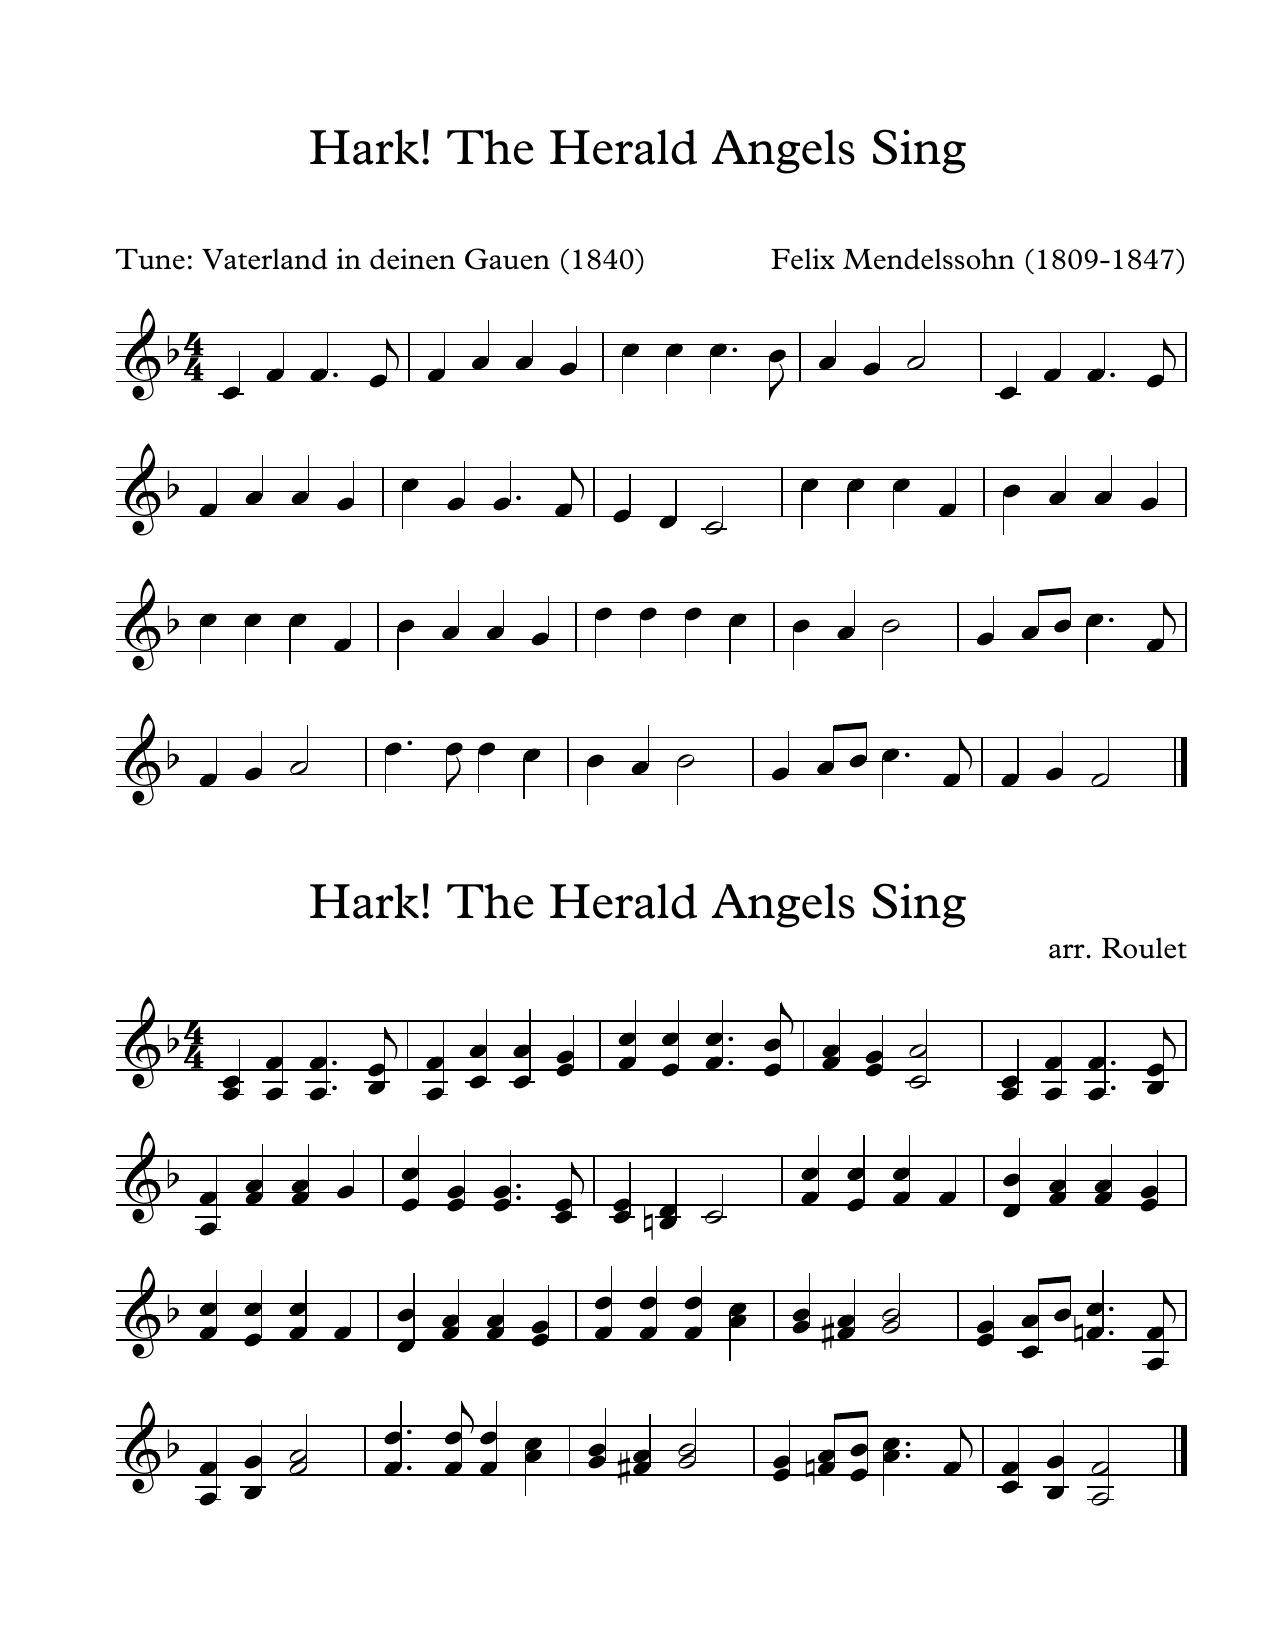 Felix Mendelssohn Hark The Harold Angels Sing (arr. Patrick Roulet) sheet music notes and chords. Download Printable PDF.